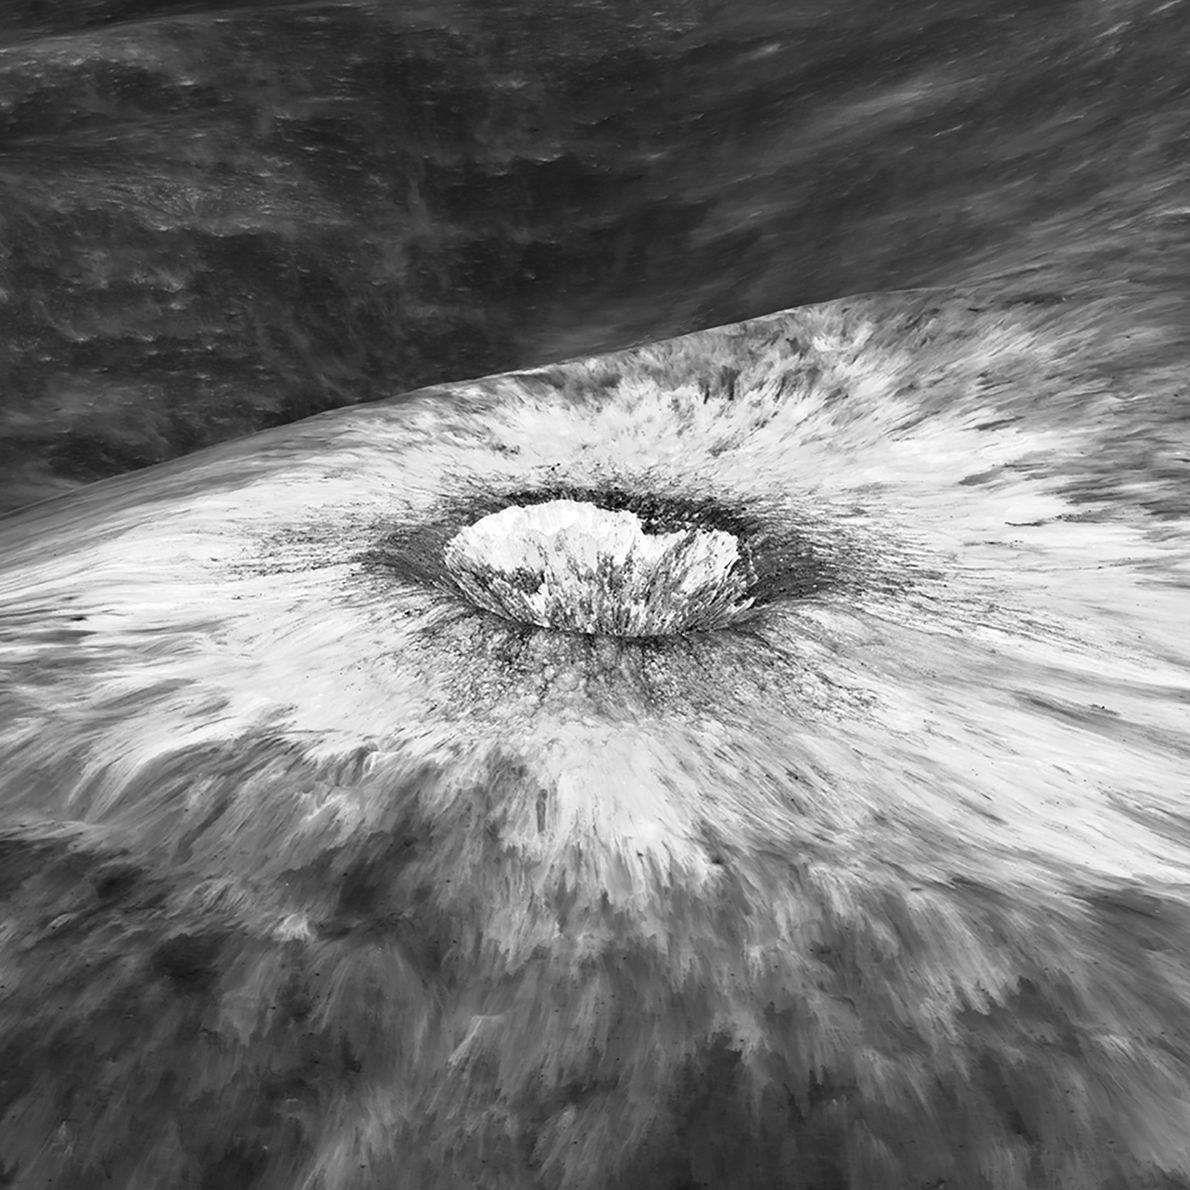 Cráter Chaplygin